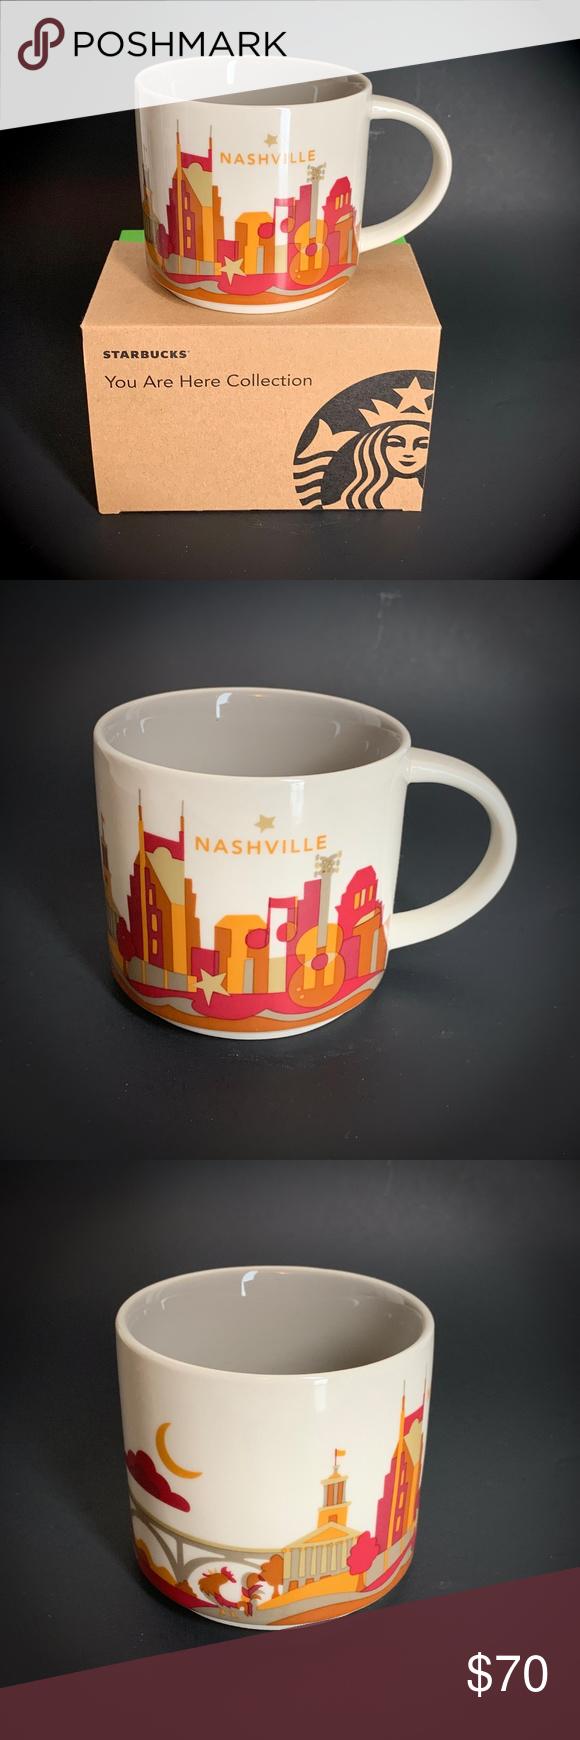 Starbucks You Are Here NASHVILLE Skyline Mug NEW NWT